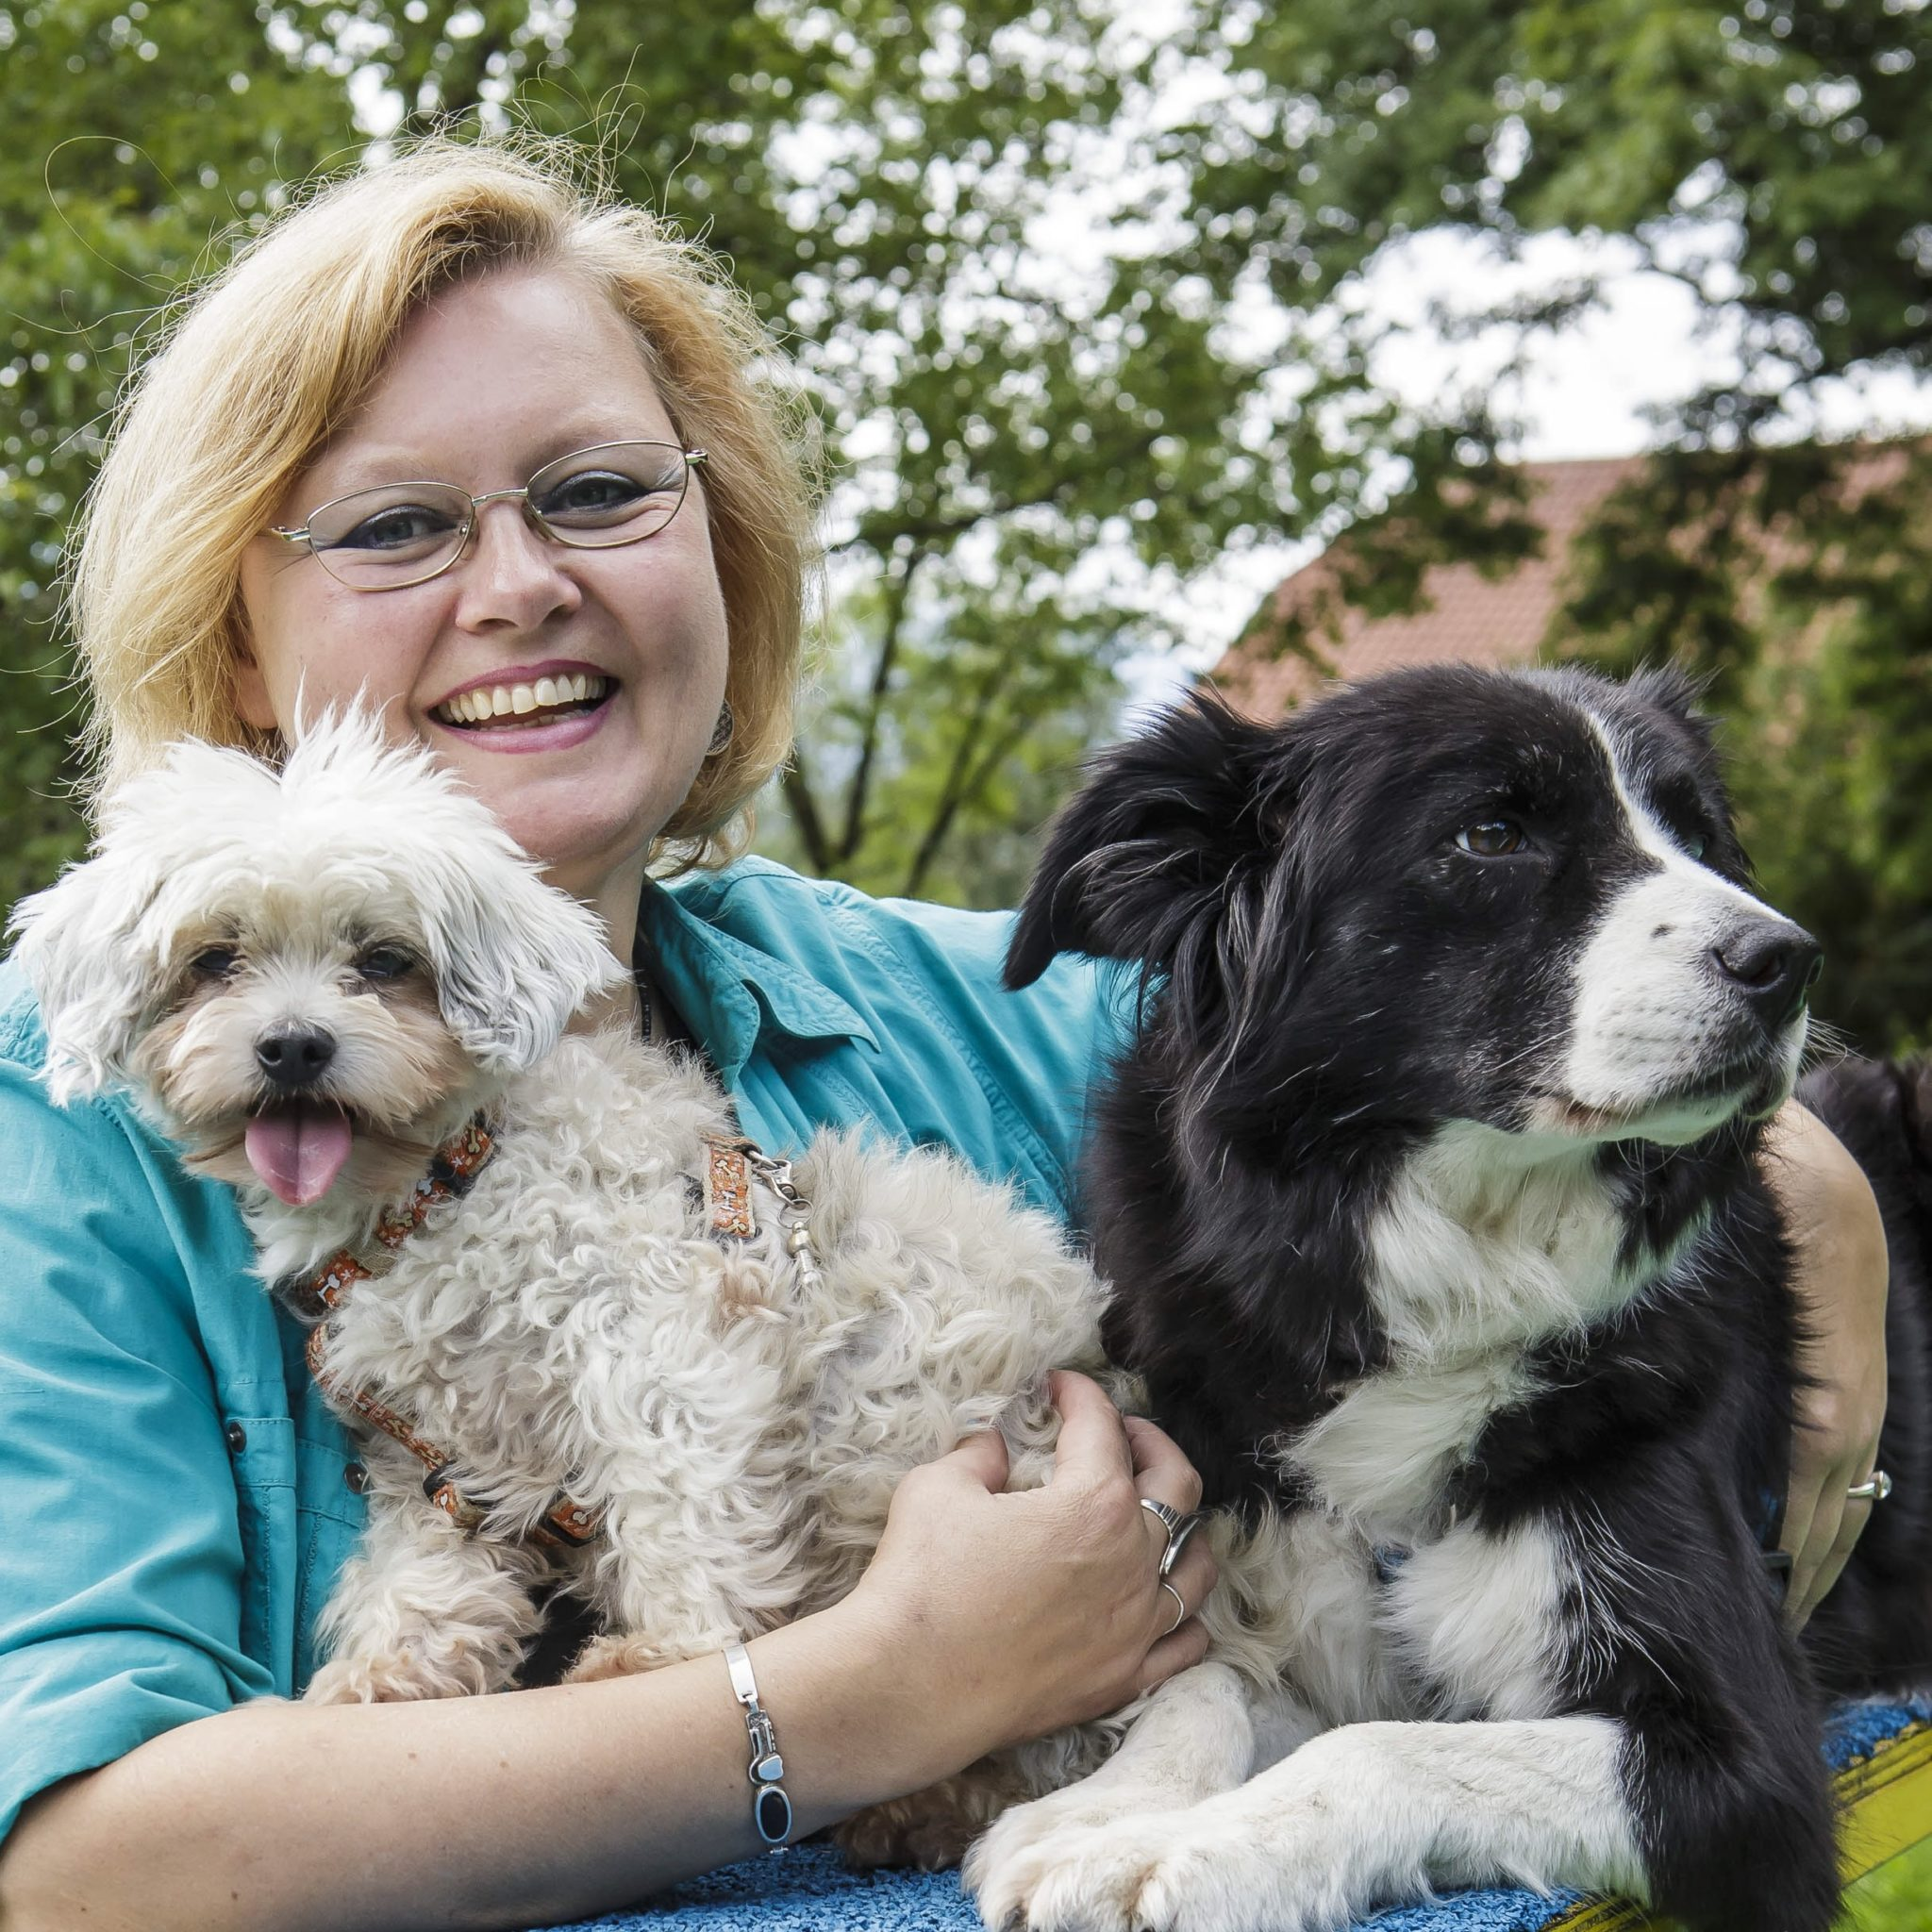 Karin Immler mit Hunden c) Andreas Kolarik Fotografie